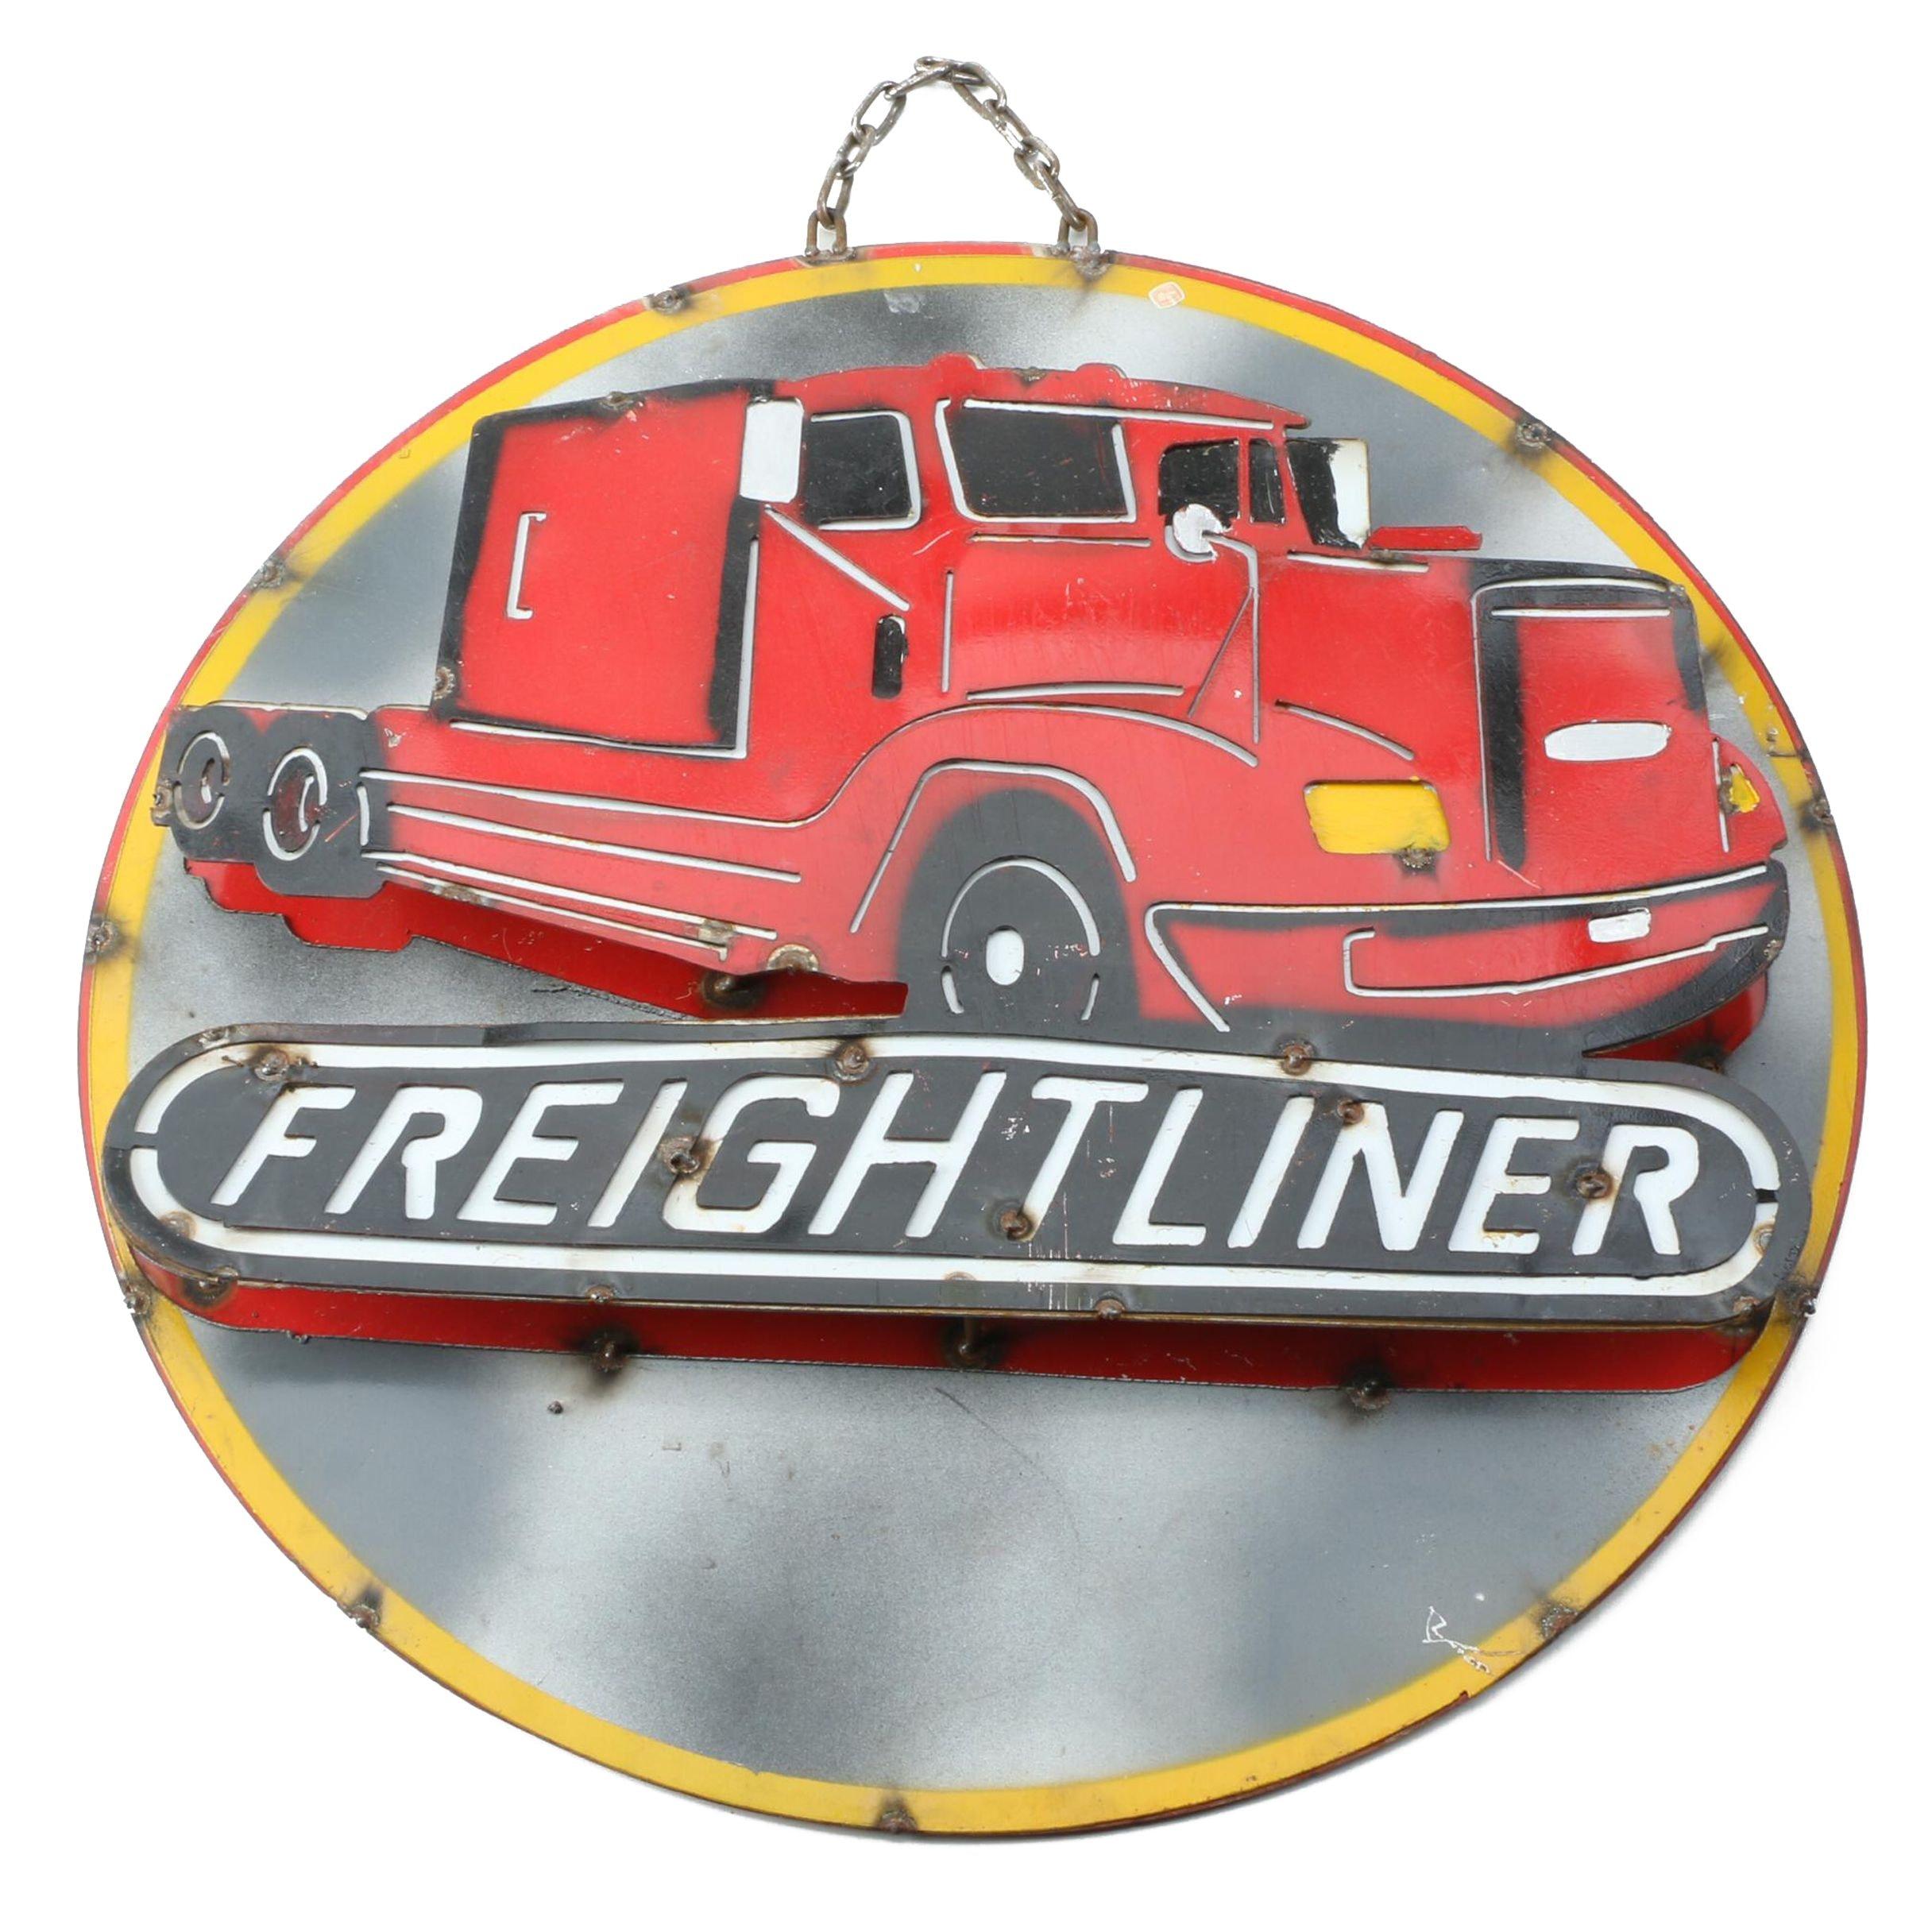 Freightliner Metal Sign